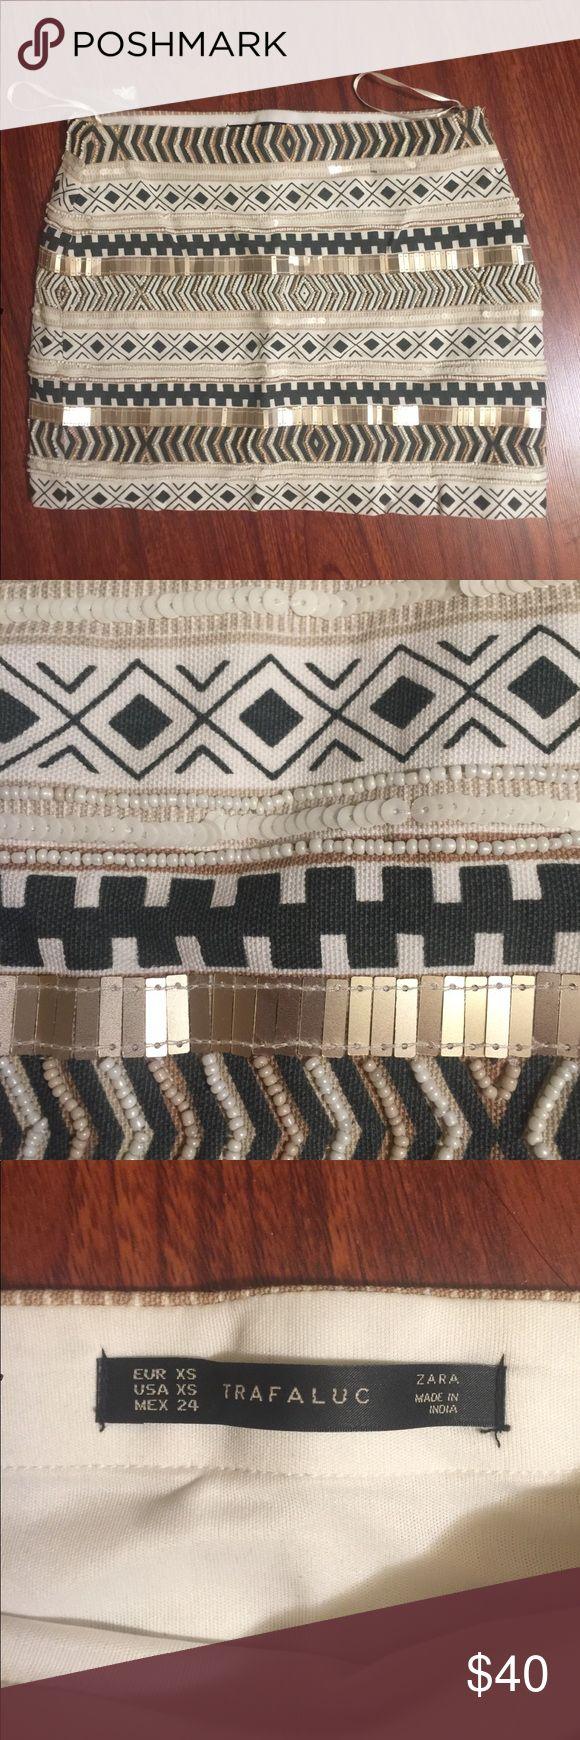 Brand New Zara Sequin Aztec Mini Skirt Never worn. New with tag. Original price is $79.90 Zara Skirts Mini